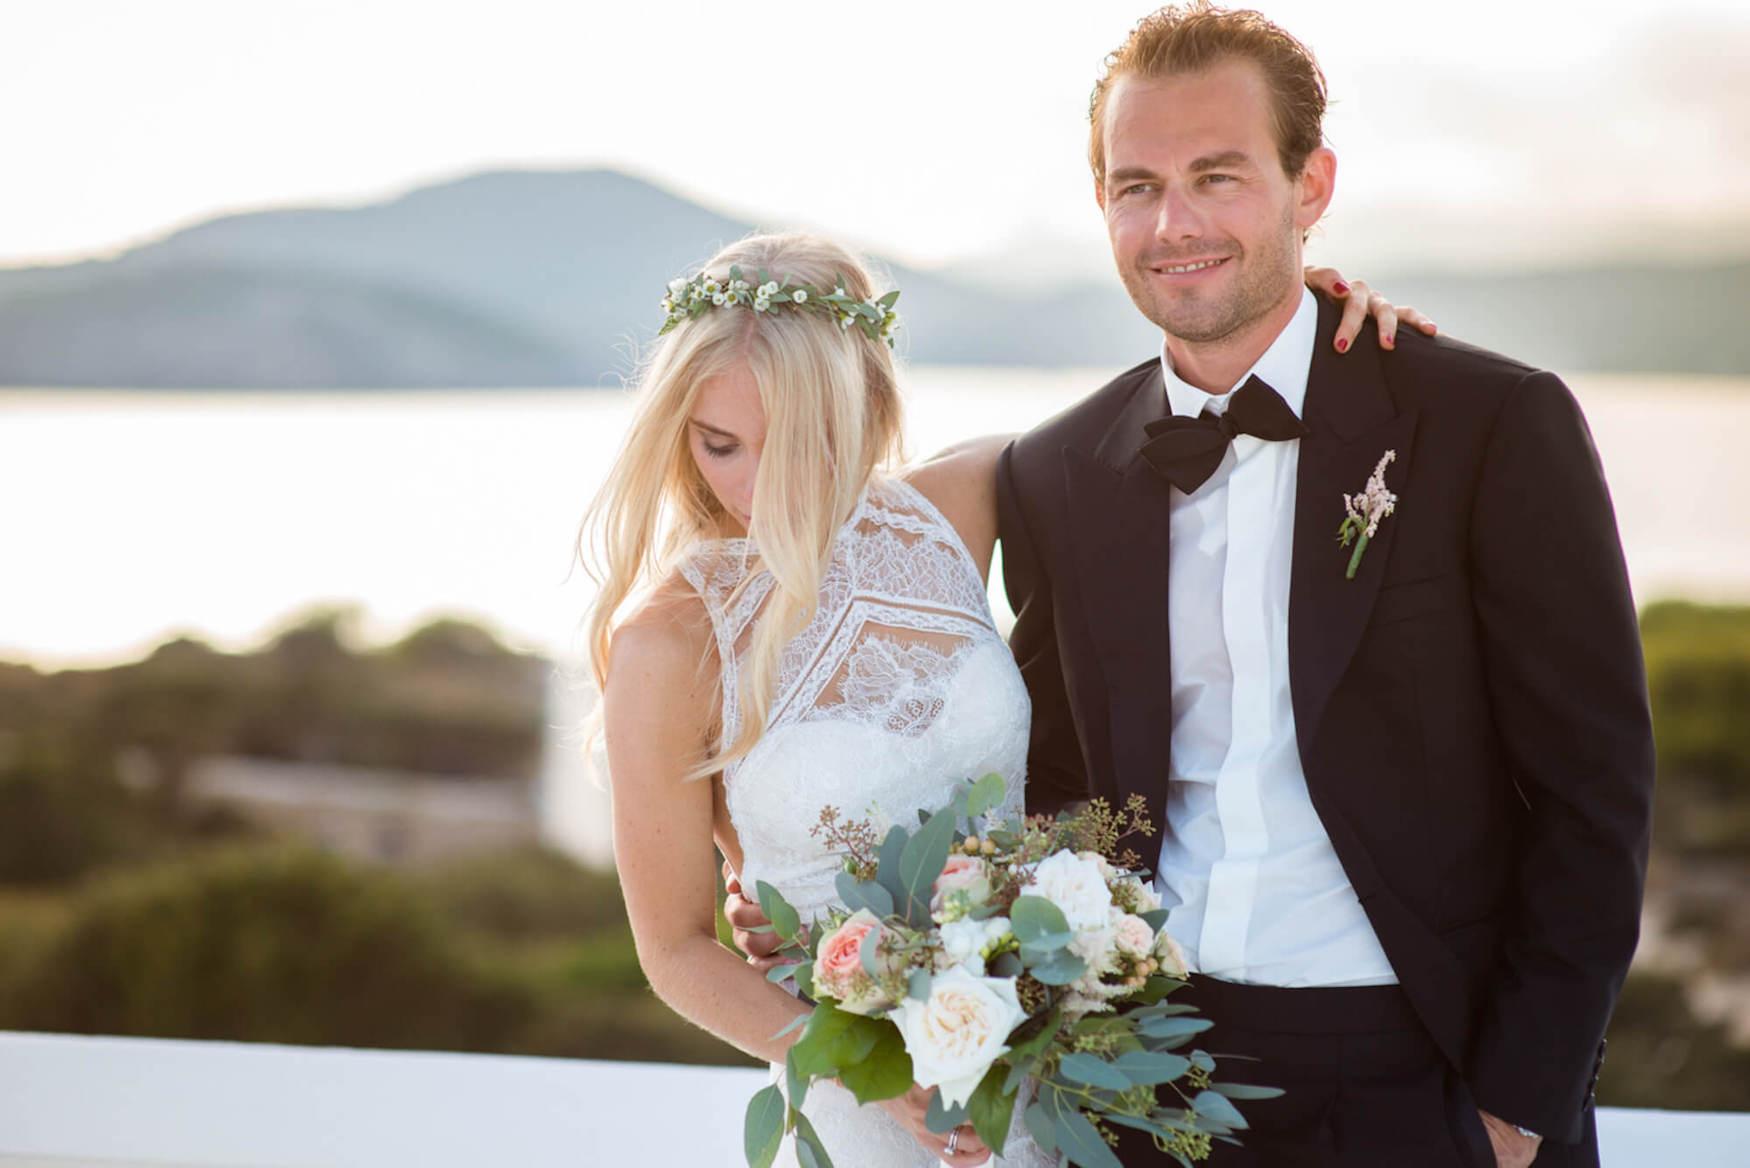 bride groom sunset kissgolden hour black tie flower crown pronovias dress